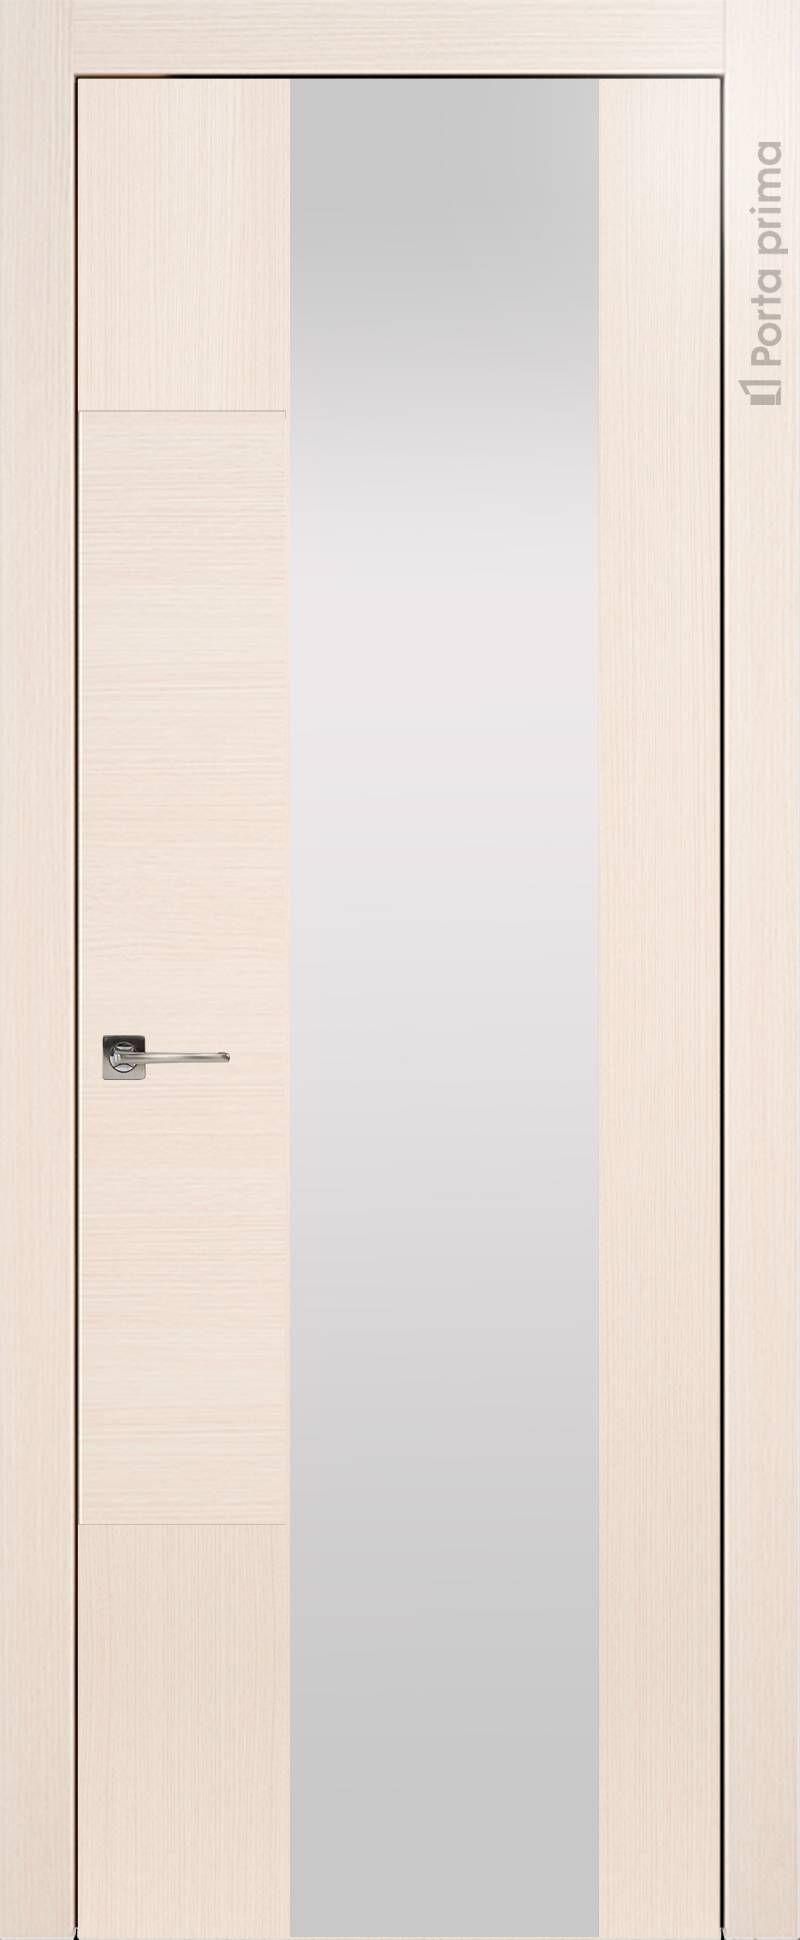 Tivoli Е-1 цвет - Беленый дуб Со стеклом (ДО)